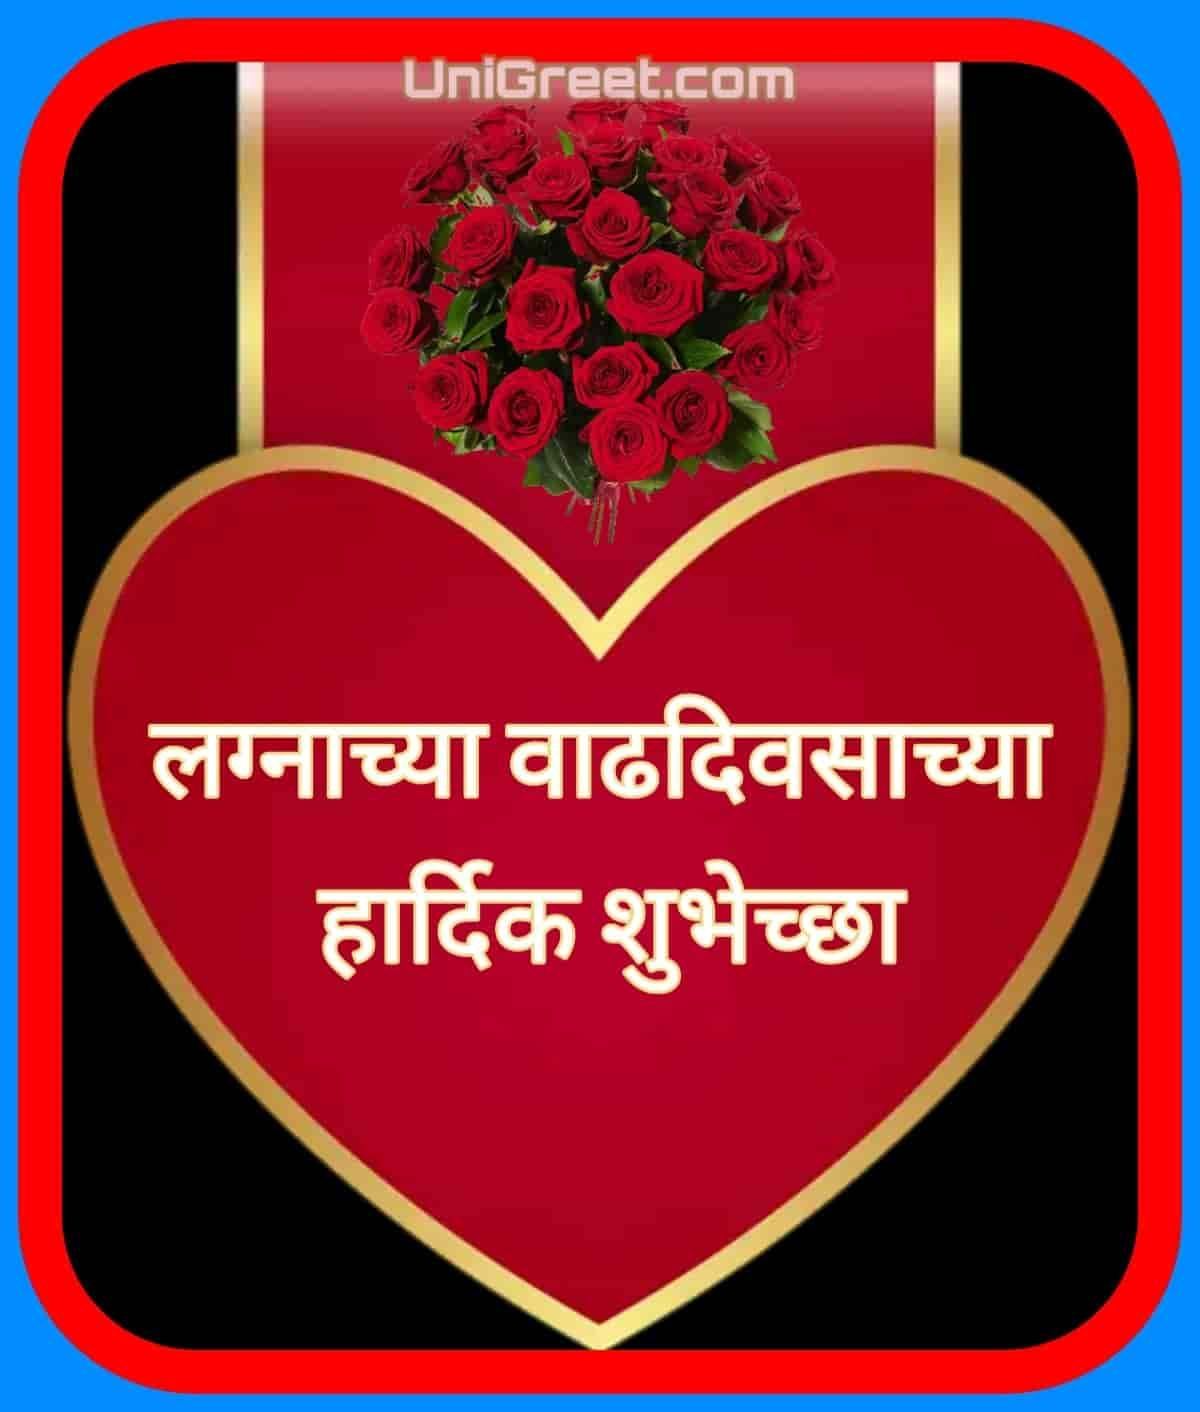 Best लगन शभचछ सदश marathi anniversary wishes